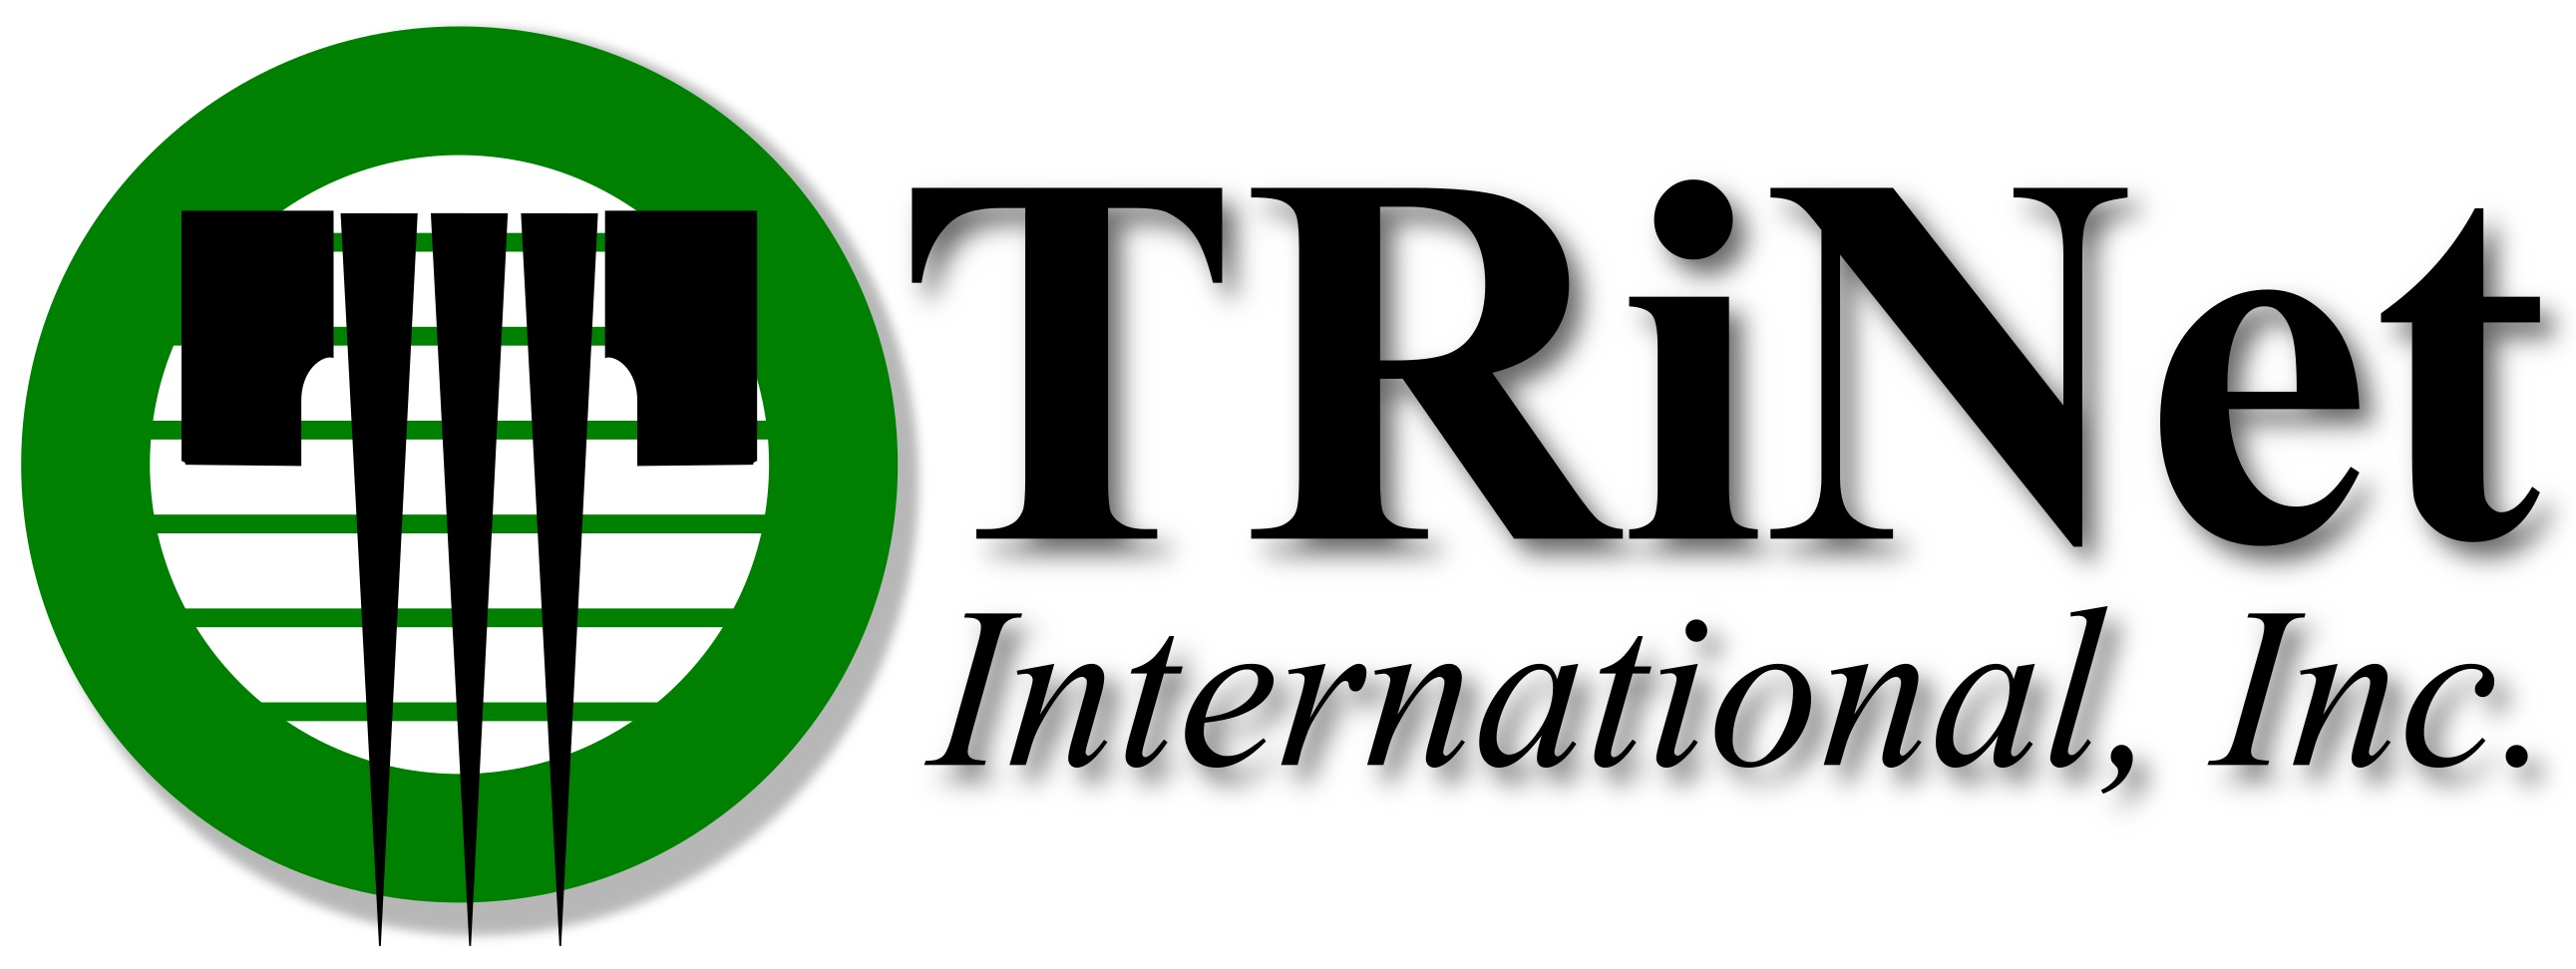 TRiNet International, INC